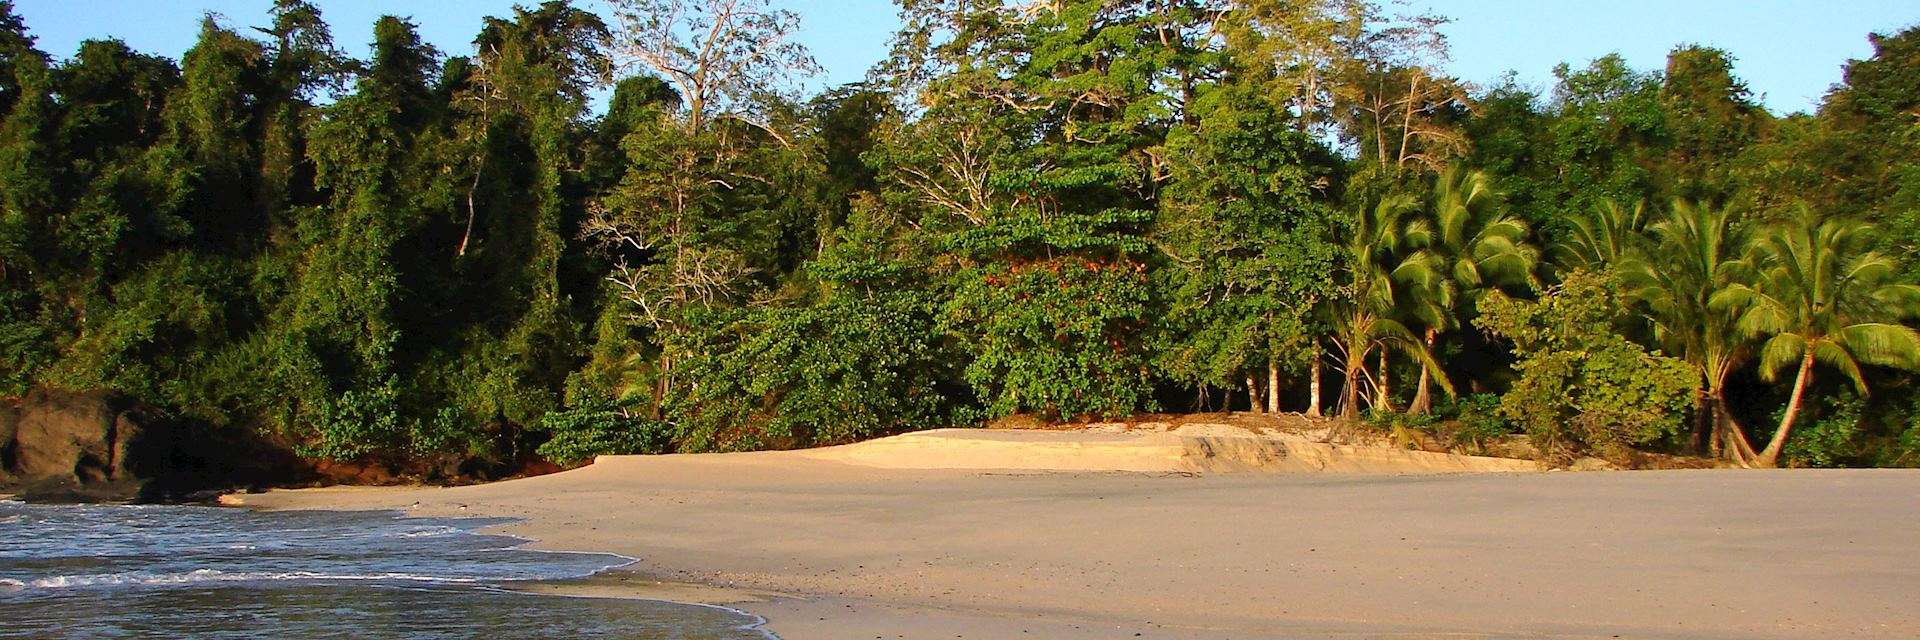 San José Island, Pearl Islands